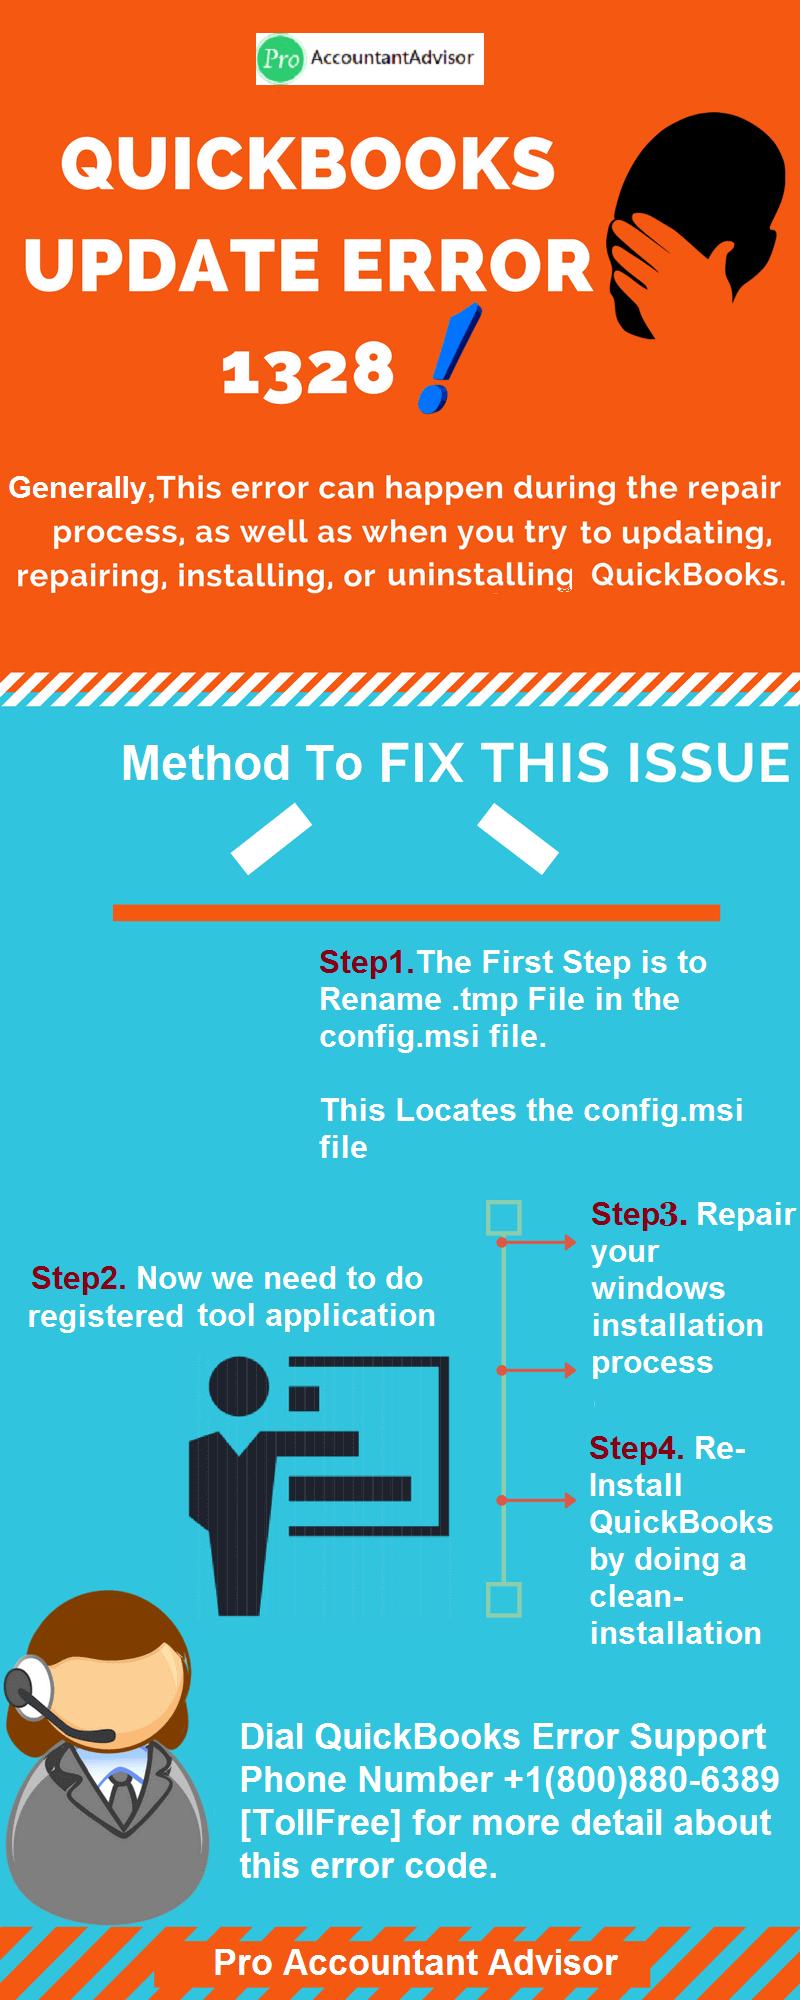 Solution of QuickBooks Error 1328 (Infographic) - Pro Accountant Advisor